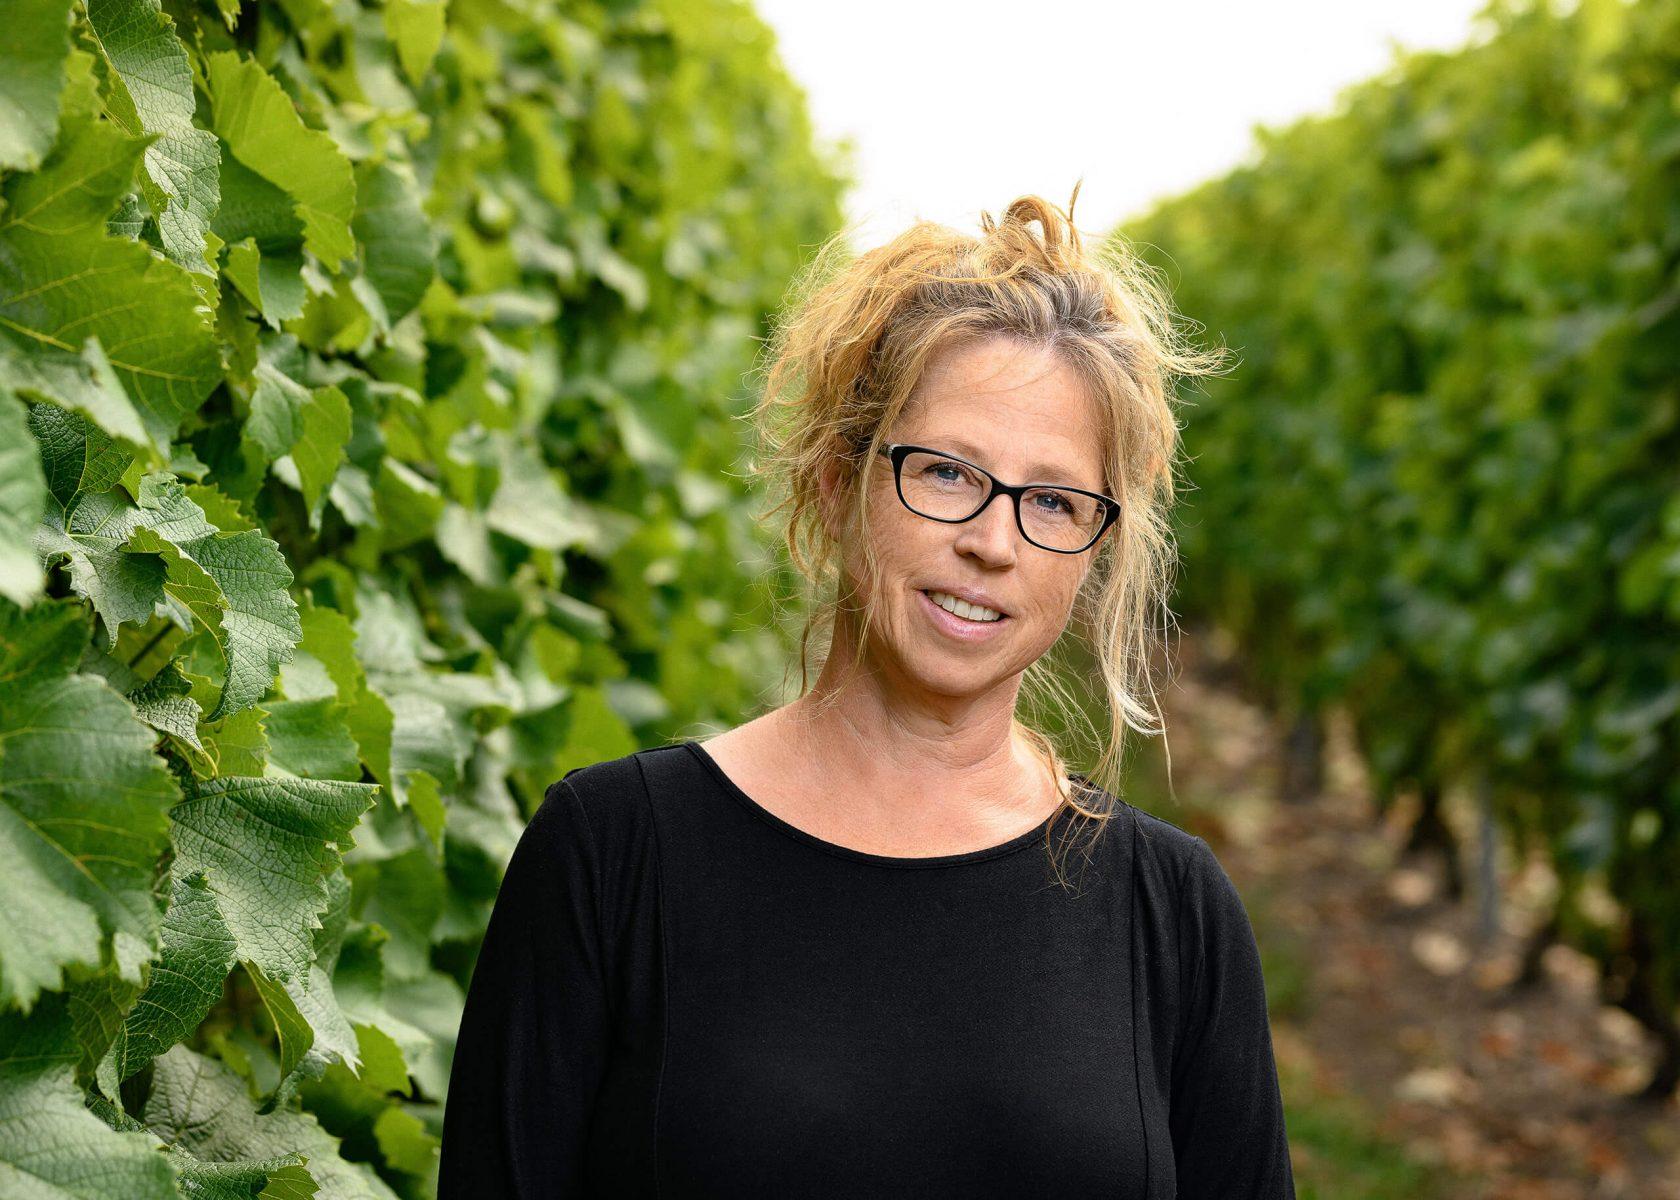 Portrait of owner of Klagshamn vineyard among the grape fields